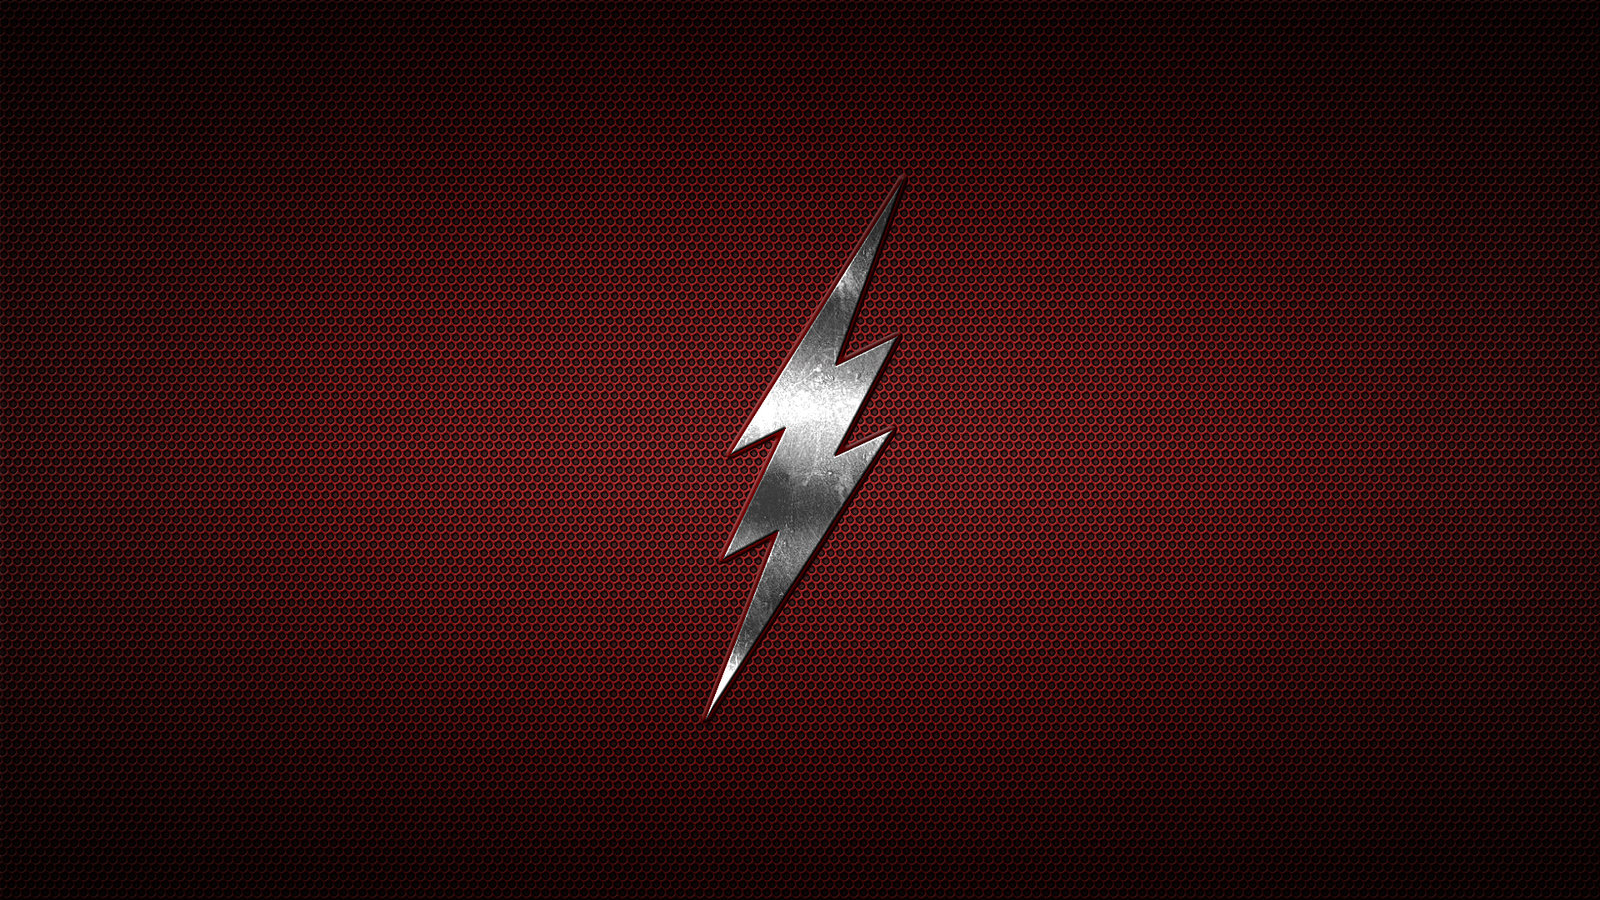 The Flash Logo Hd Wallpaper Best Wallpapers 1600x900